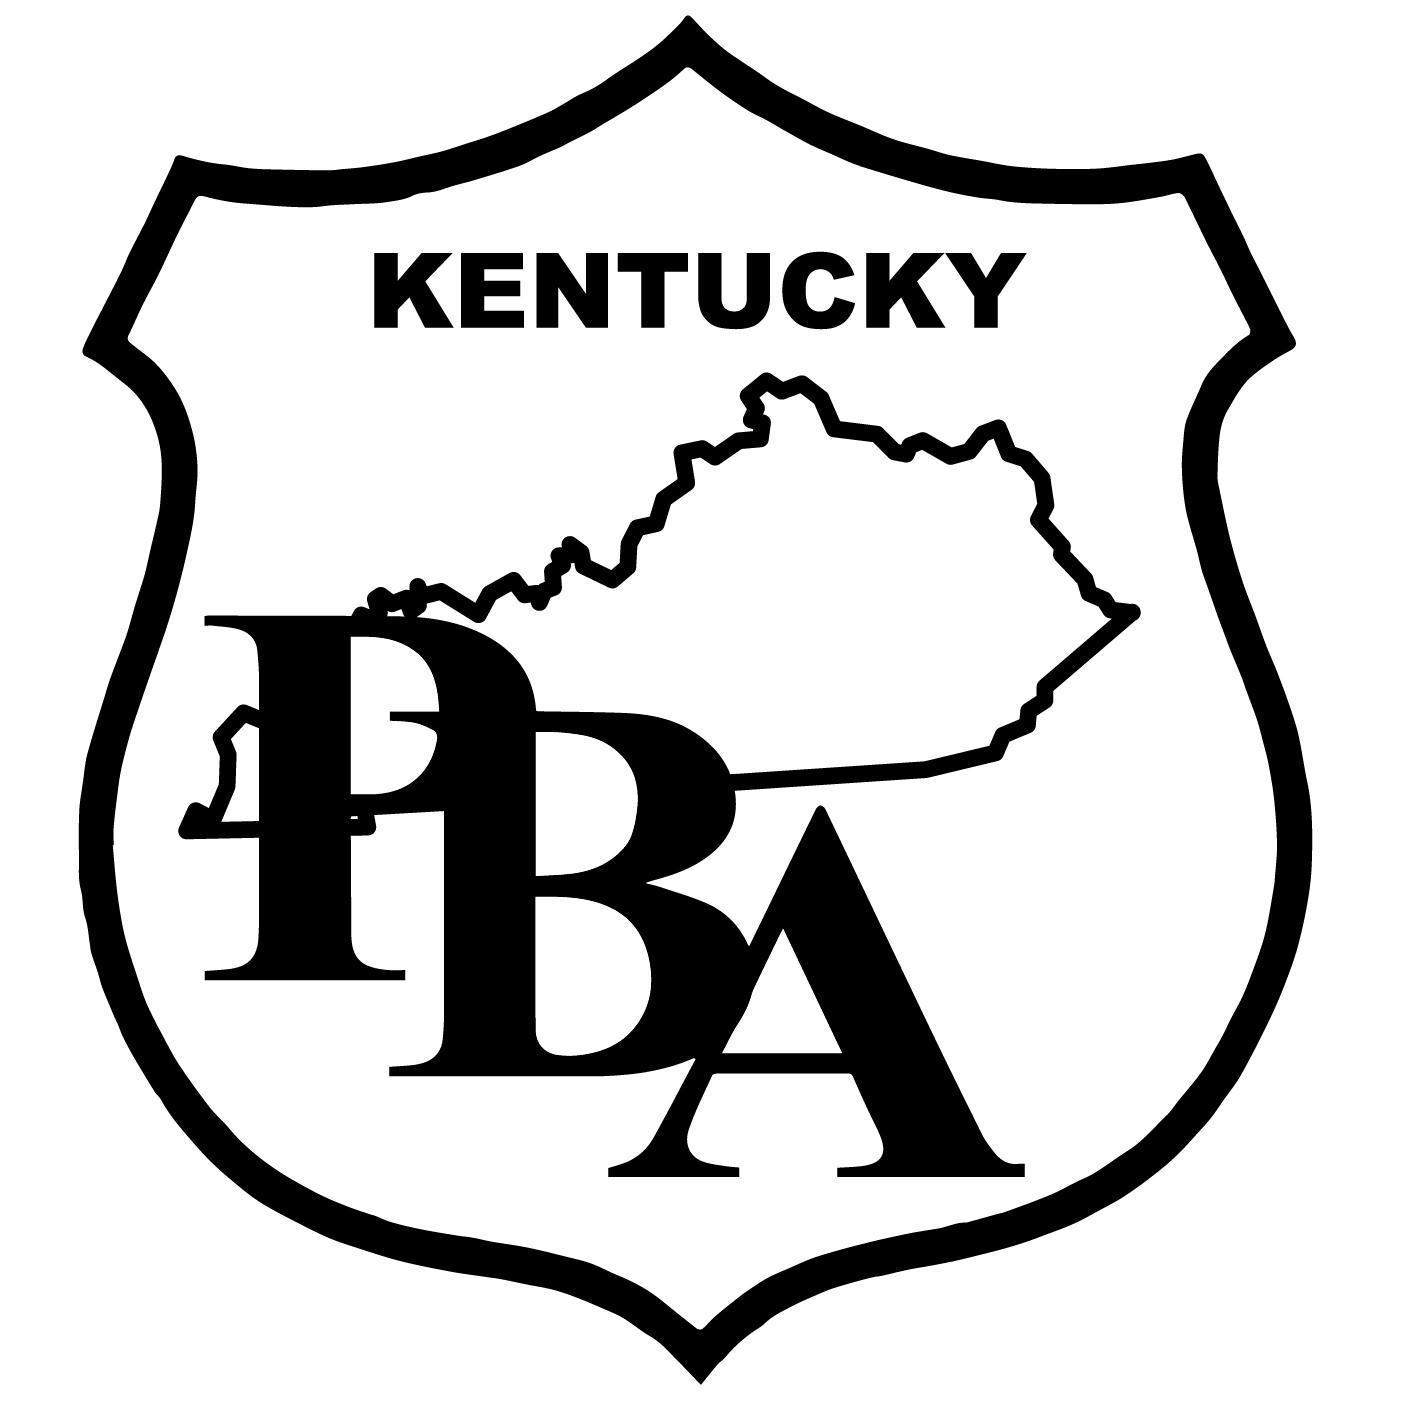 1401x1401 Kentucky Pba (@kypba) Twitter